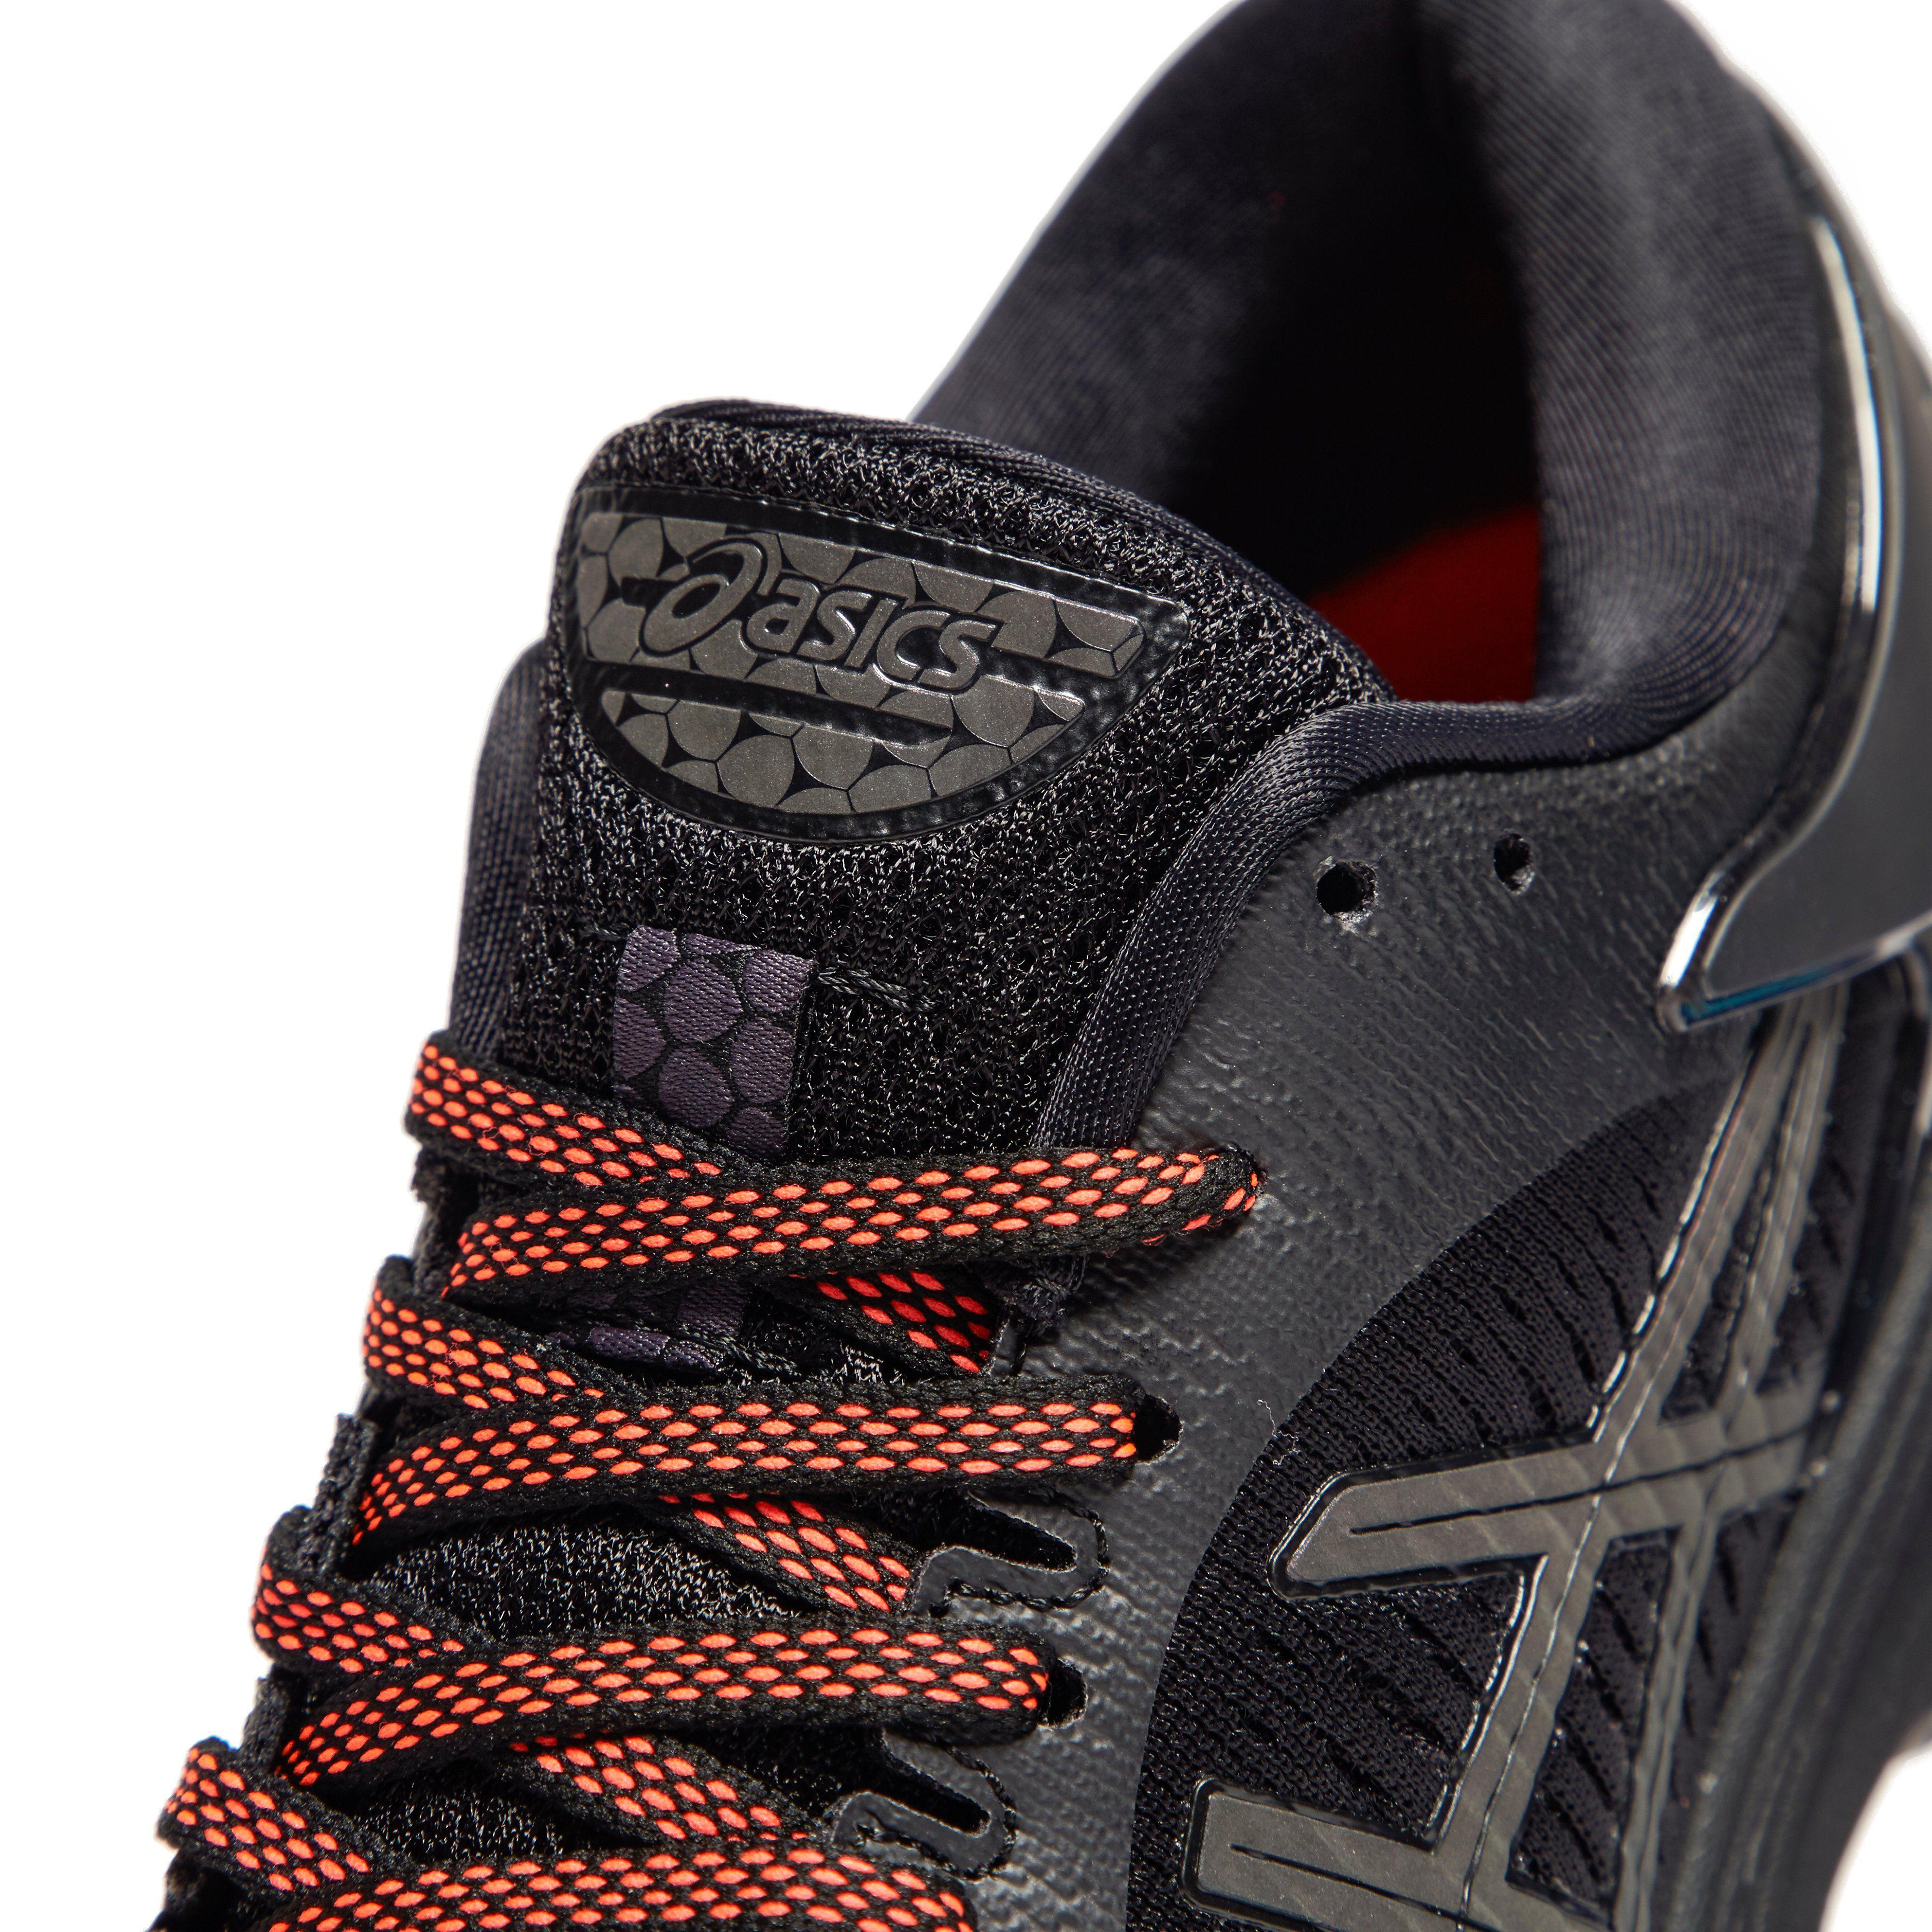 ASICS Gel-Kayano 25 Lite-Show Women's Running Shoes